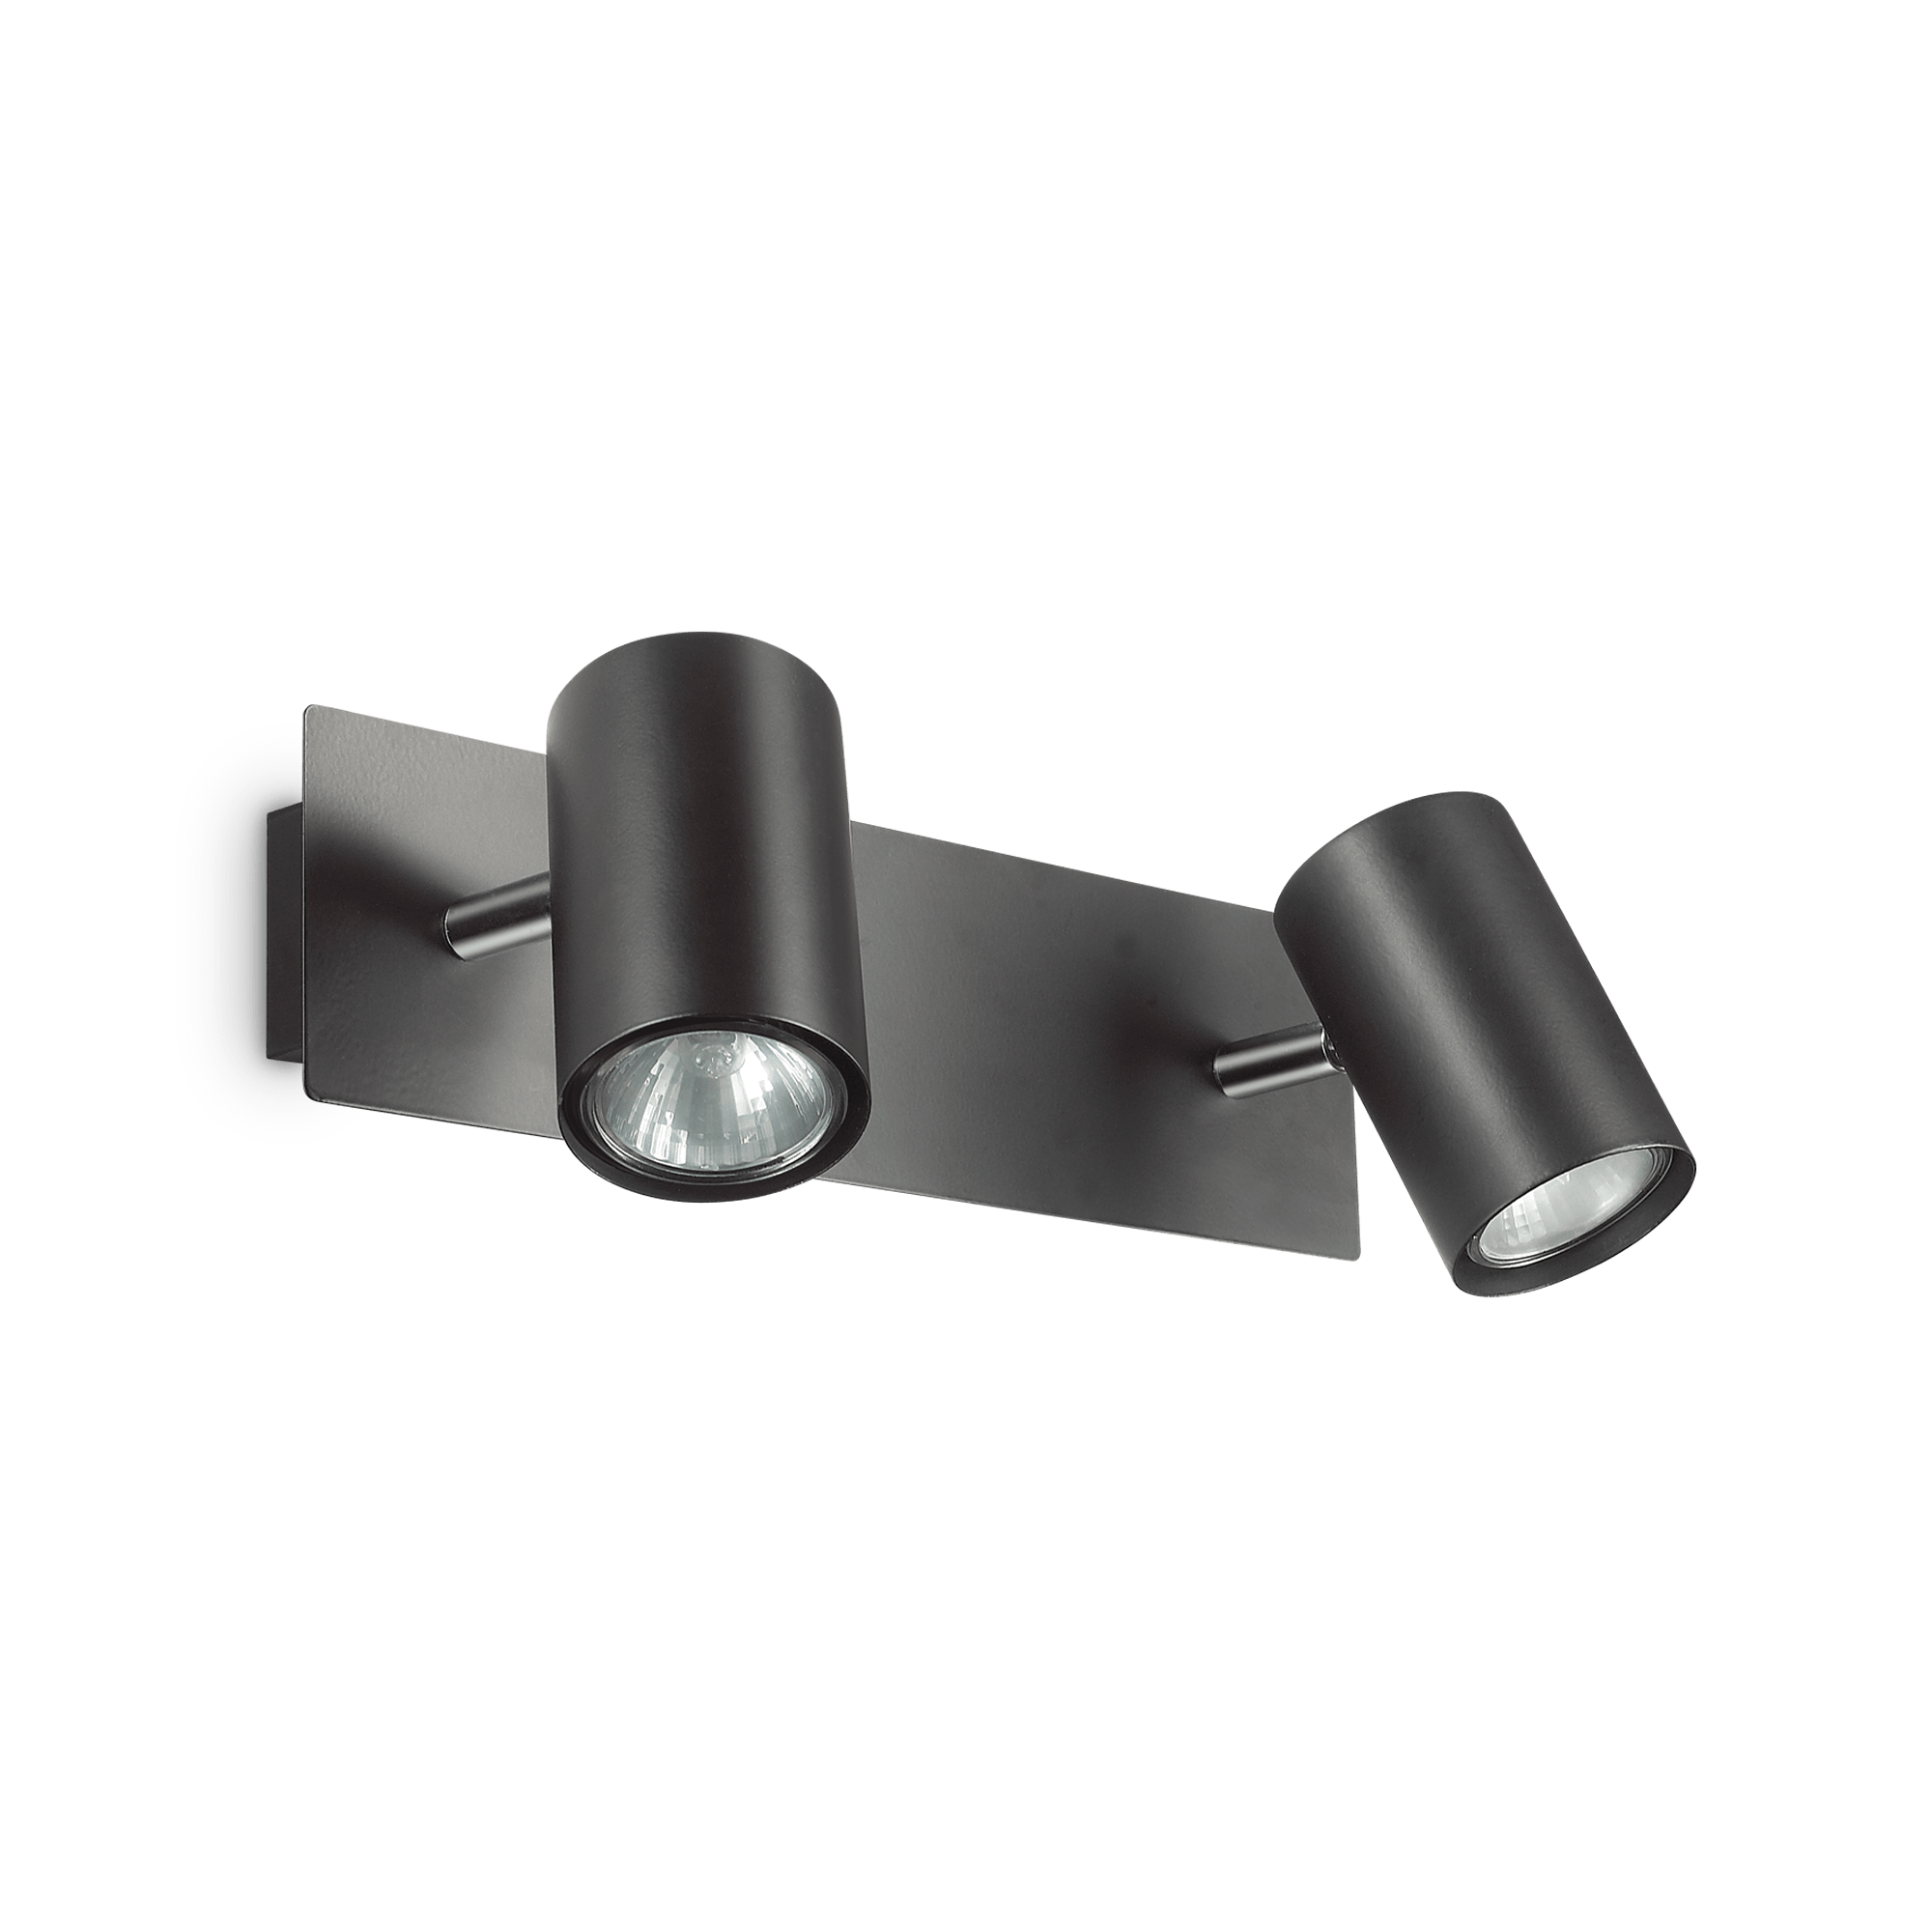 Ideal Lux 156743 SPOT AP2 NERO 2 izzós spot falilámpa